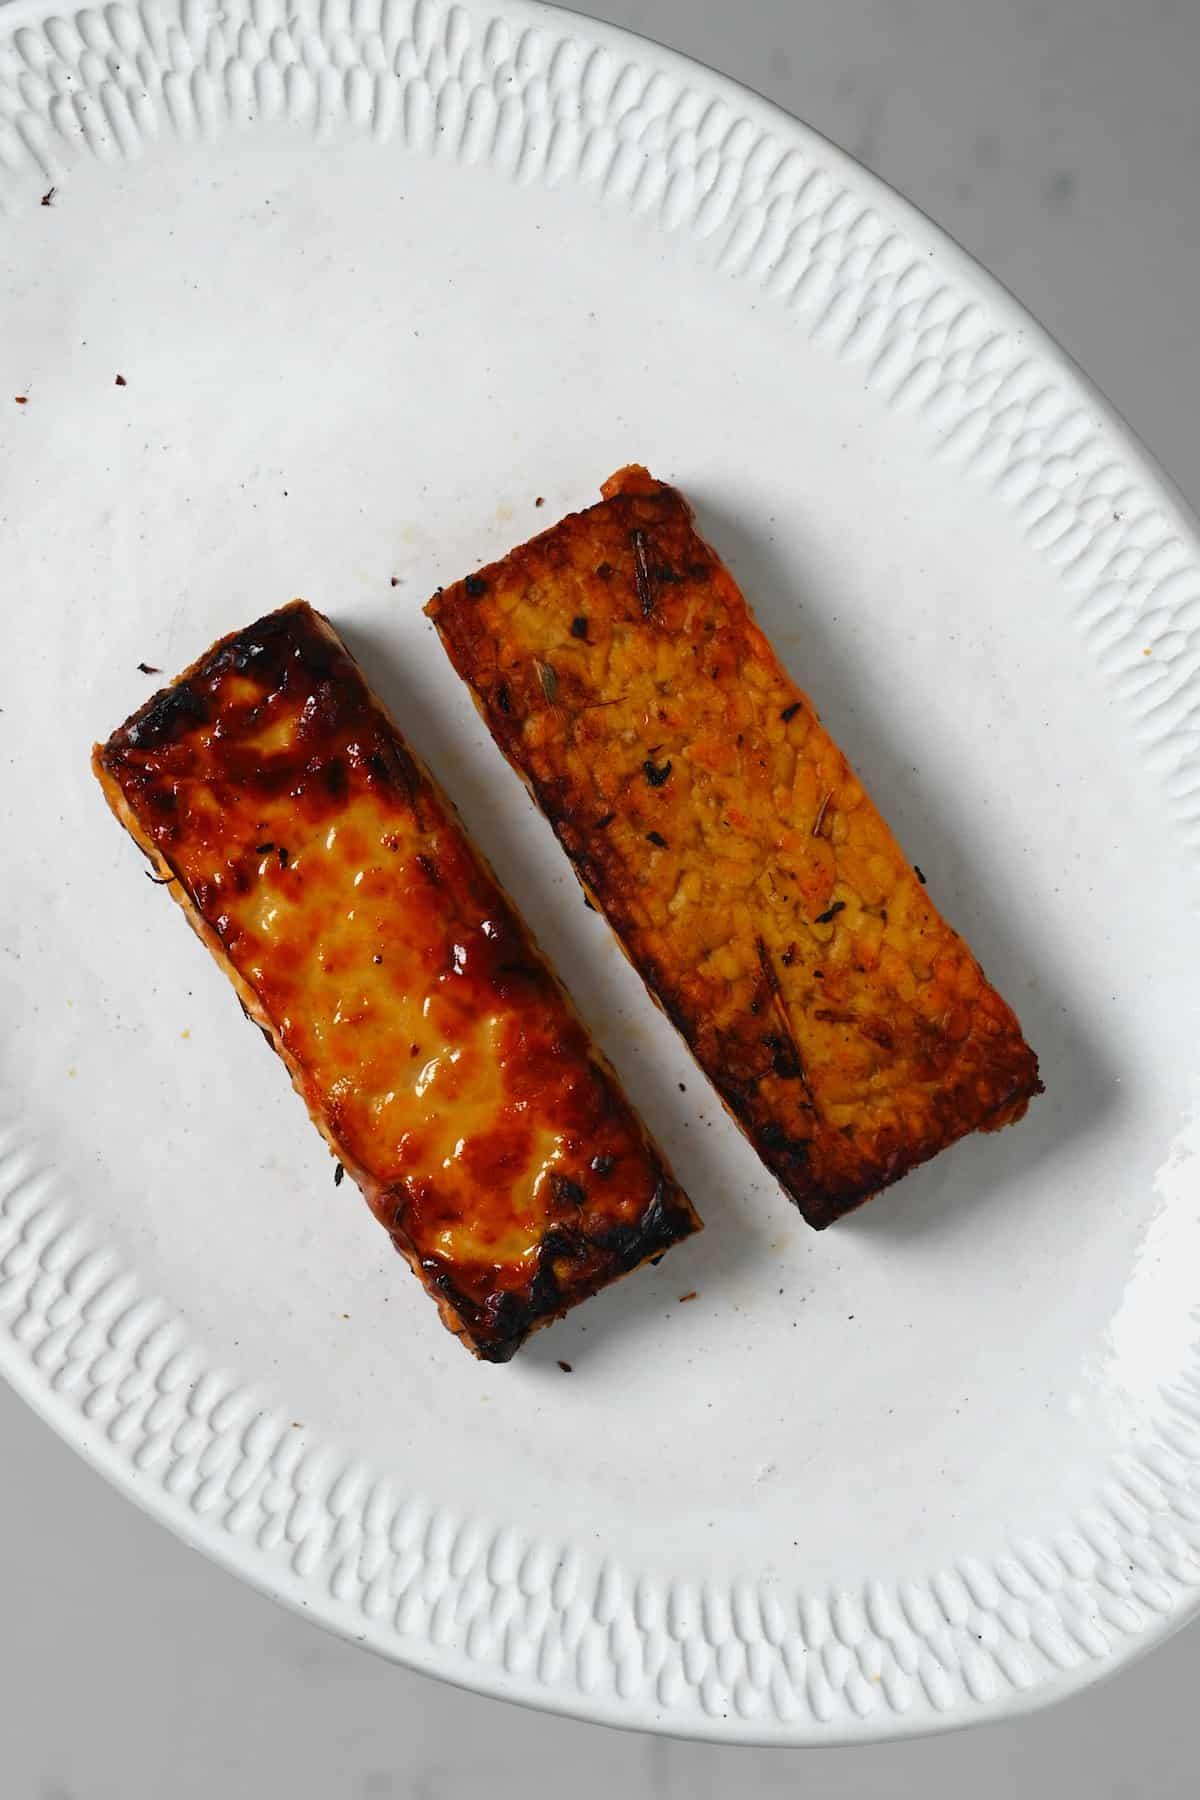 Pan-fried tempeh